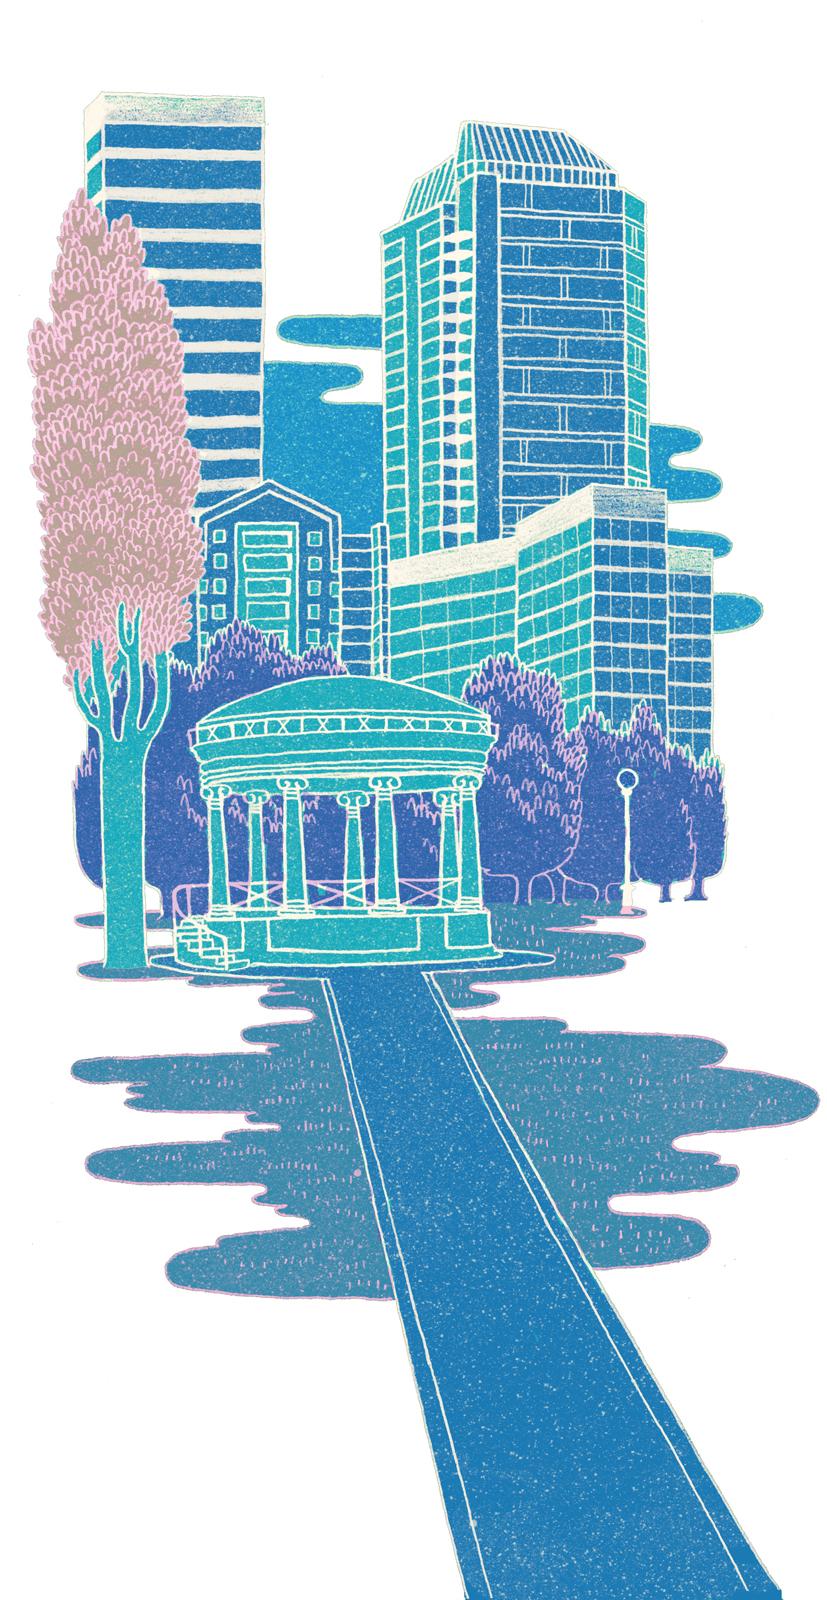 101 boston commons illustration